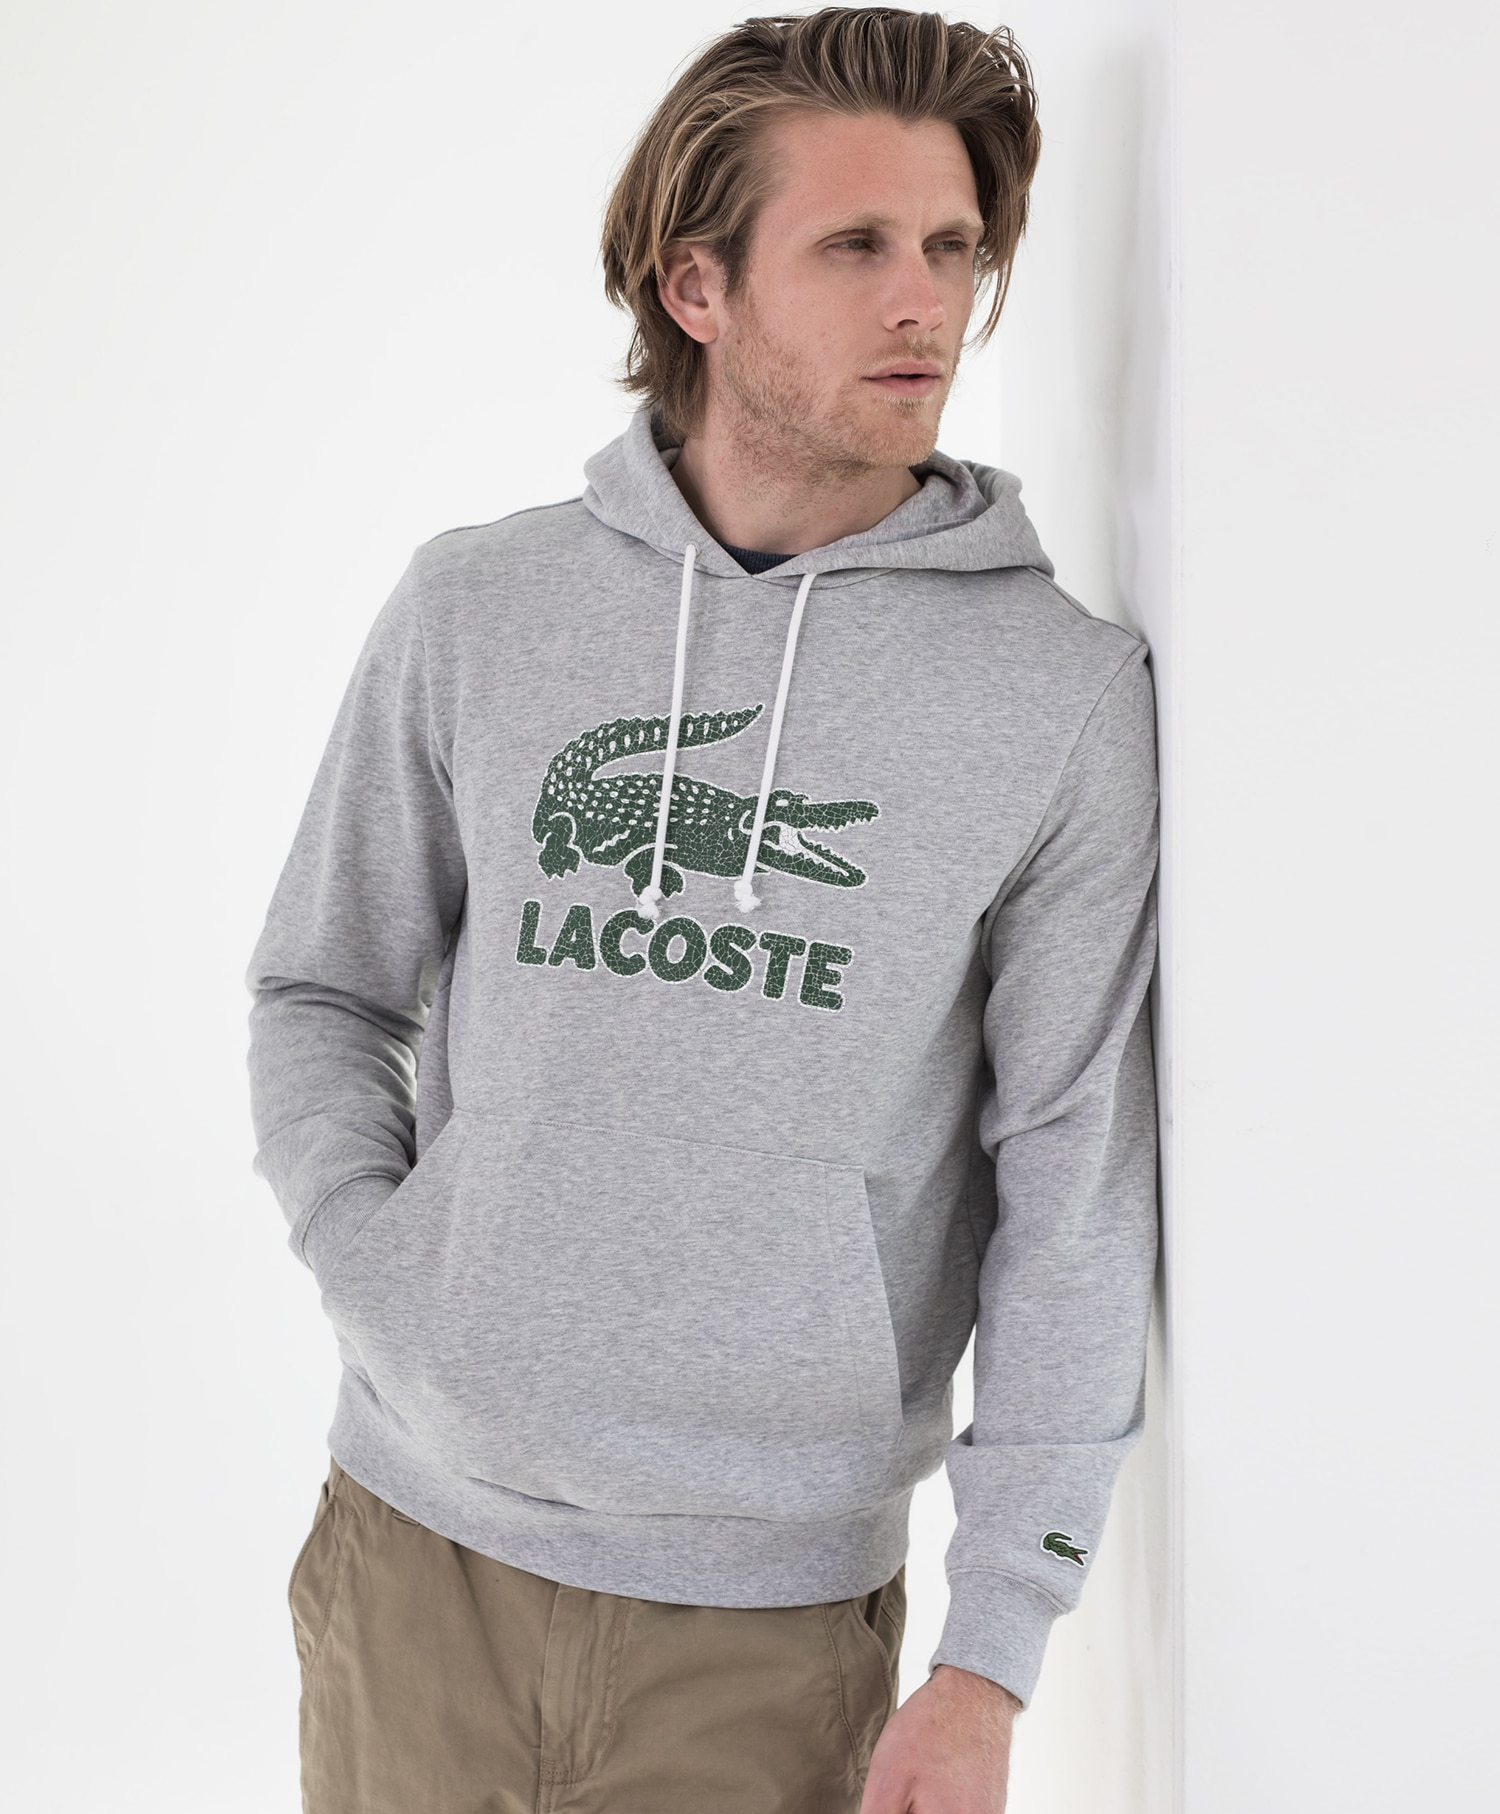 Lacoste logo genser